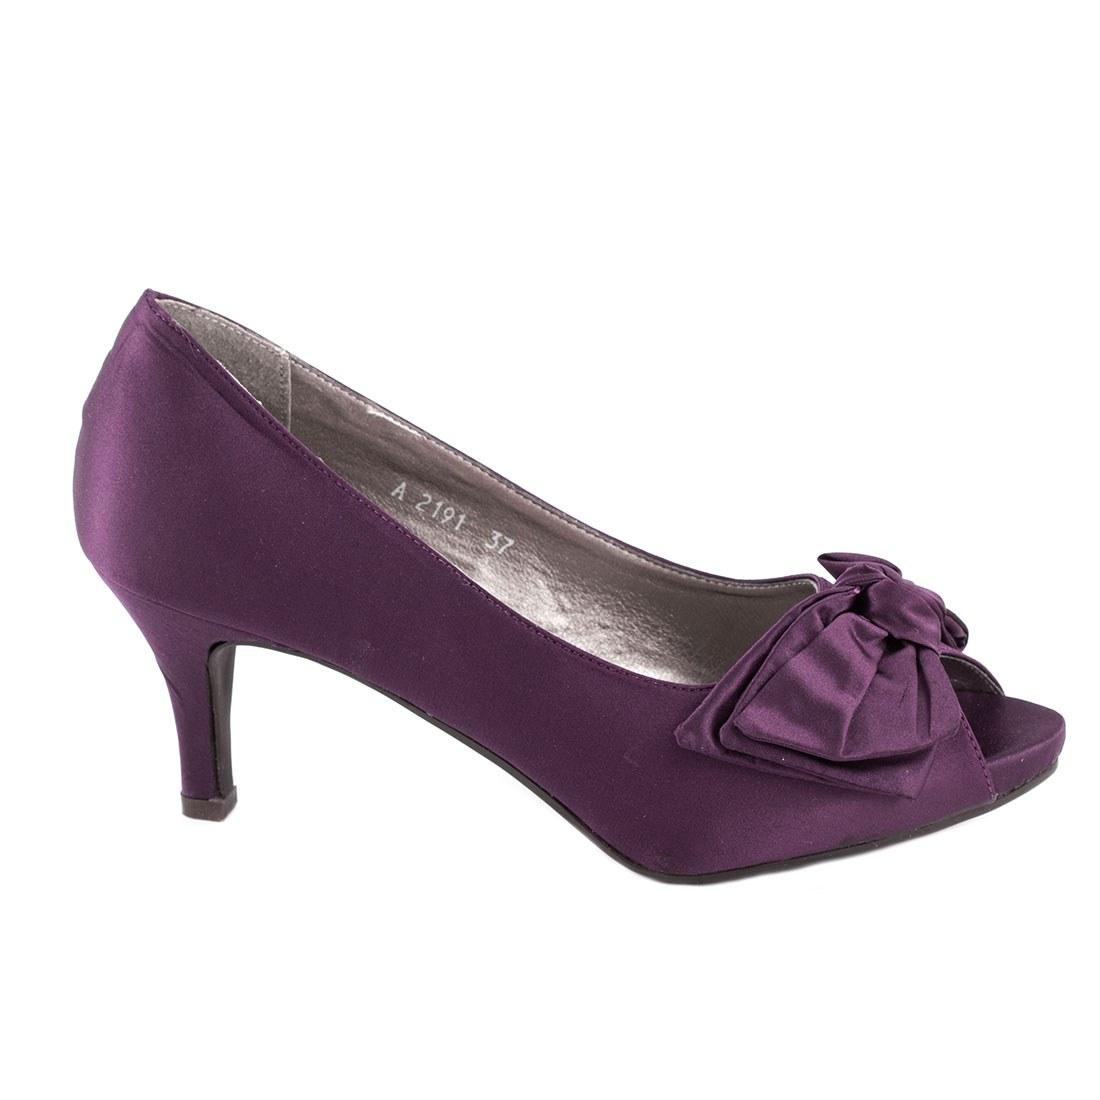 Pantofi de dama A2191-PURPLE-O